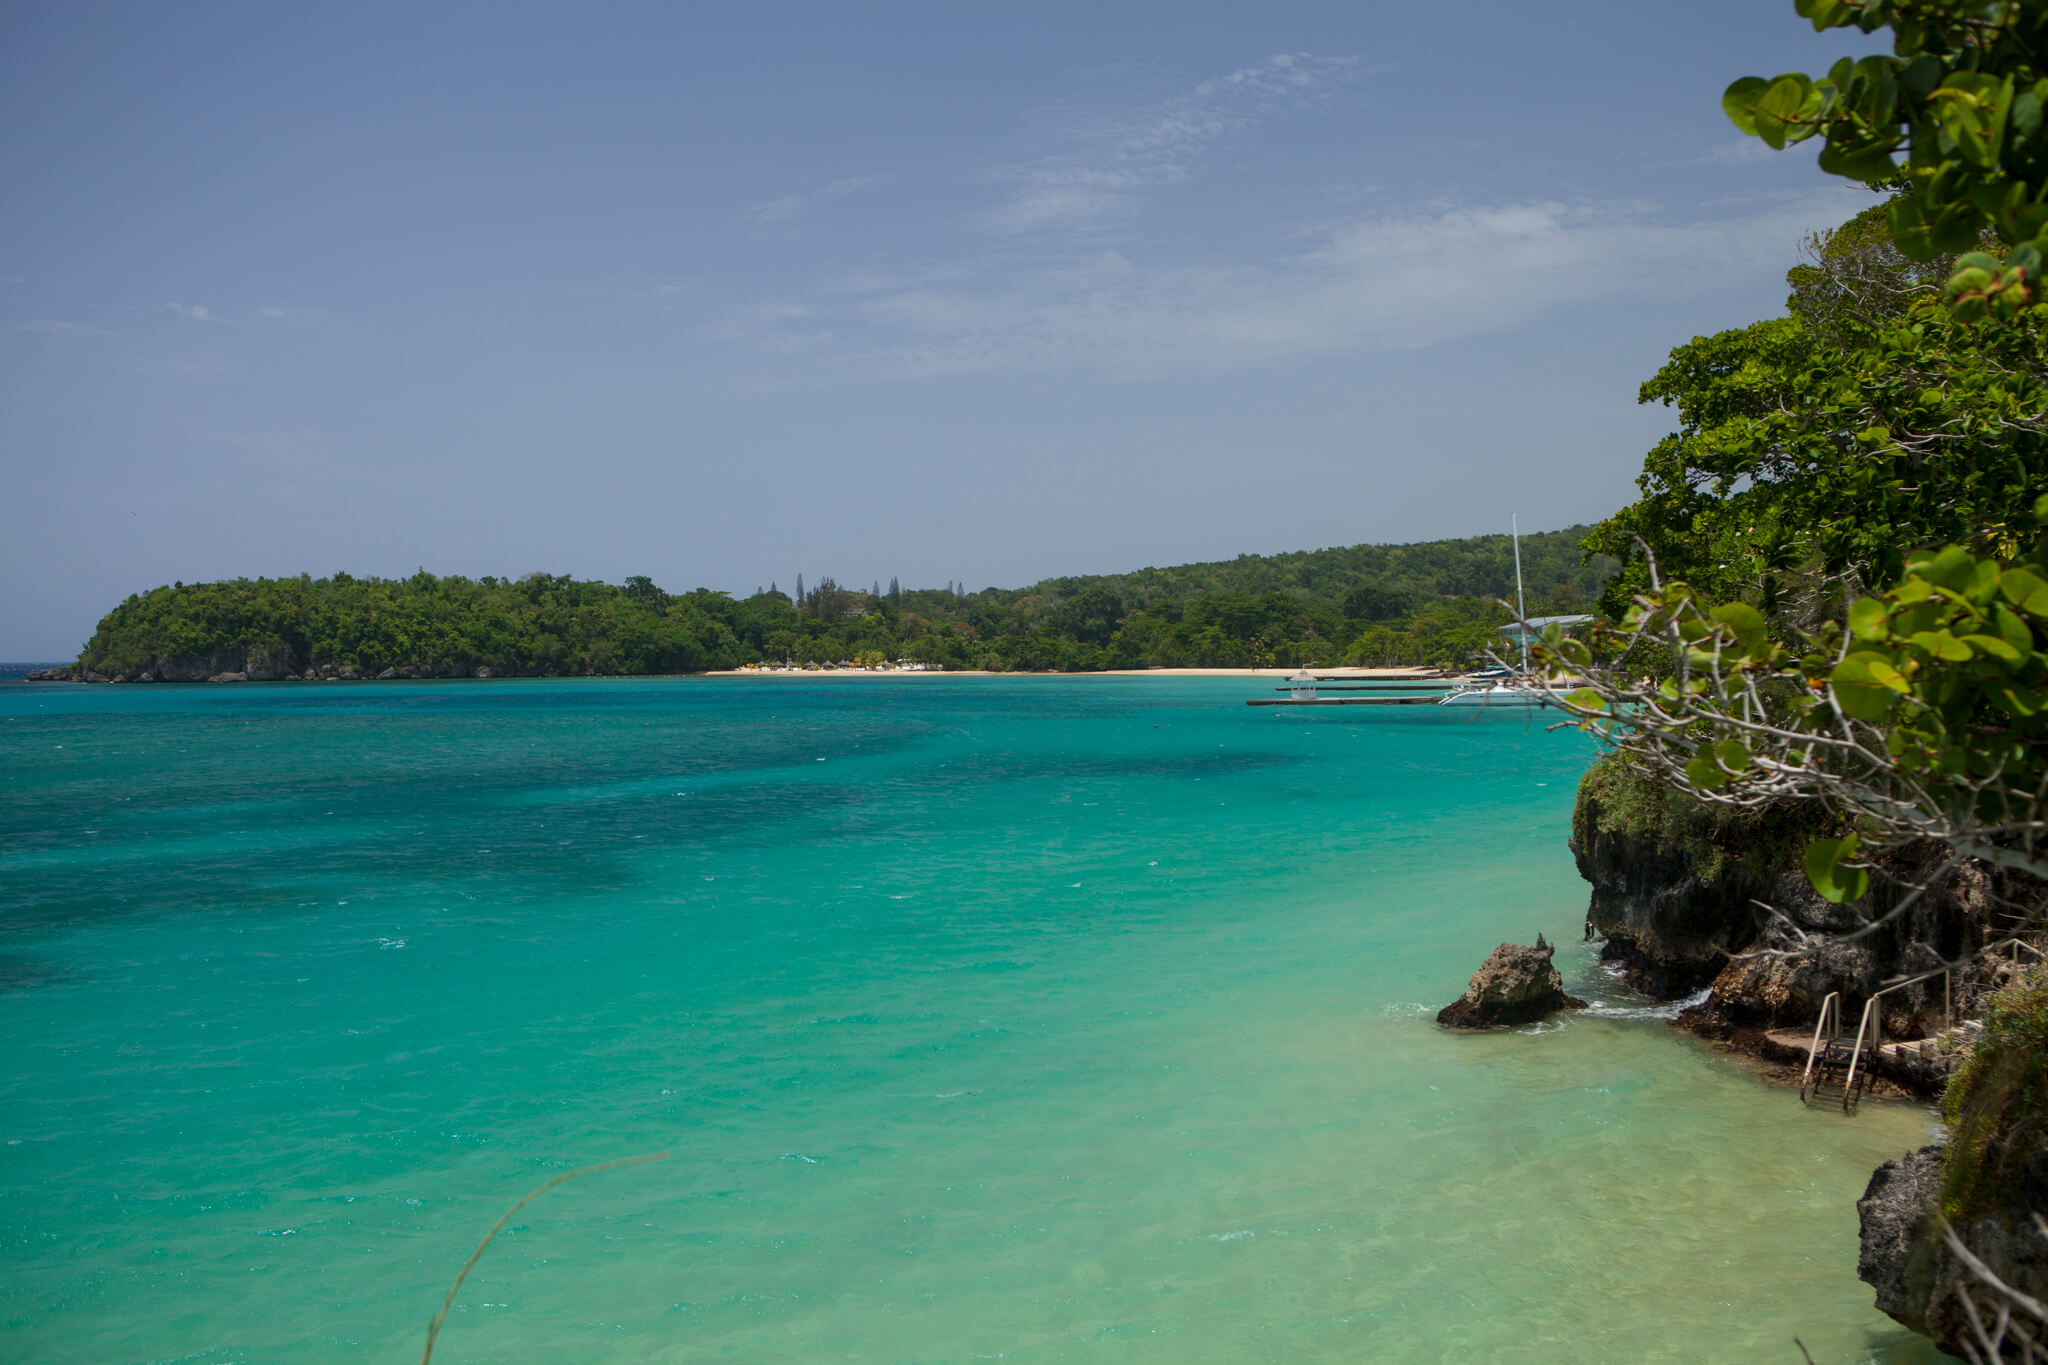 jamaica-inn-01.jpg